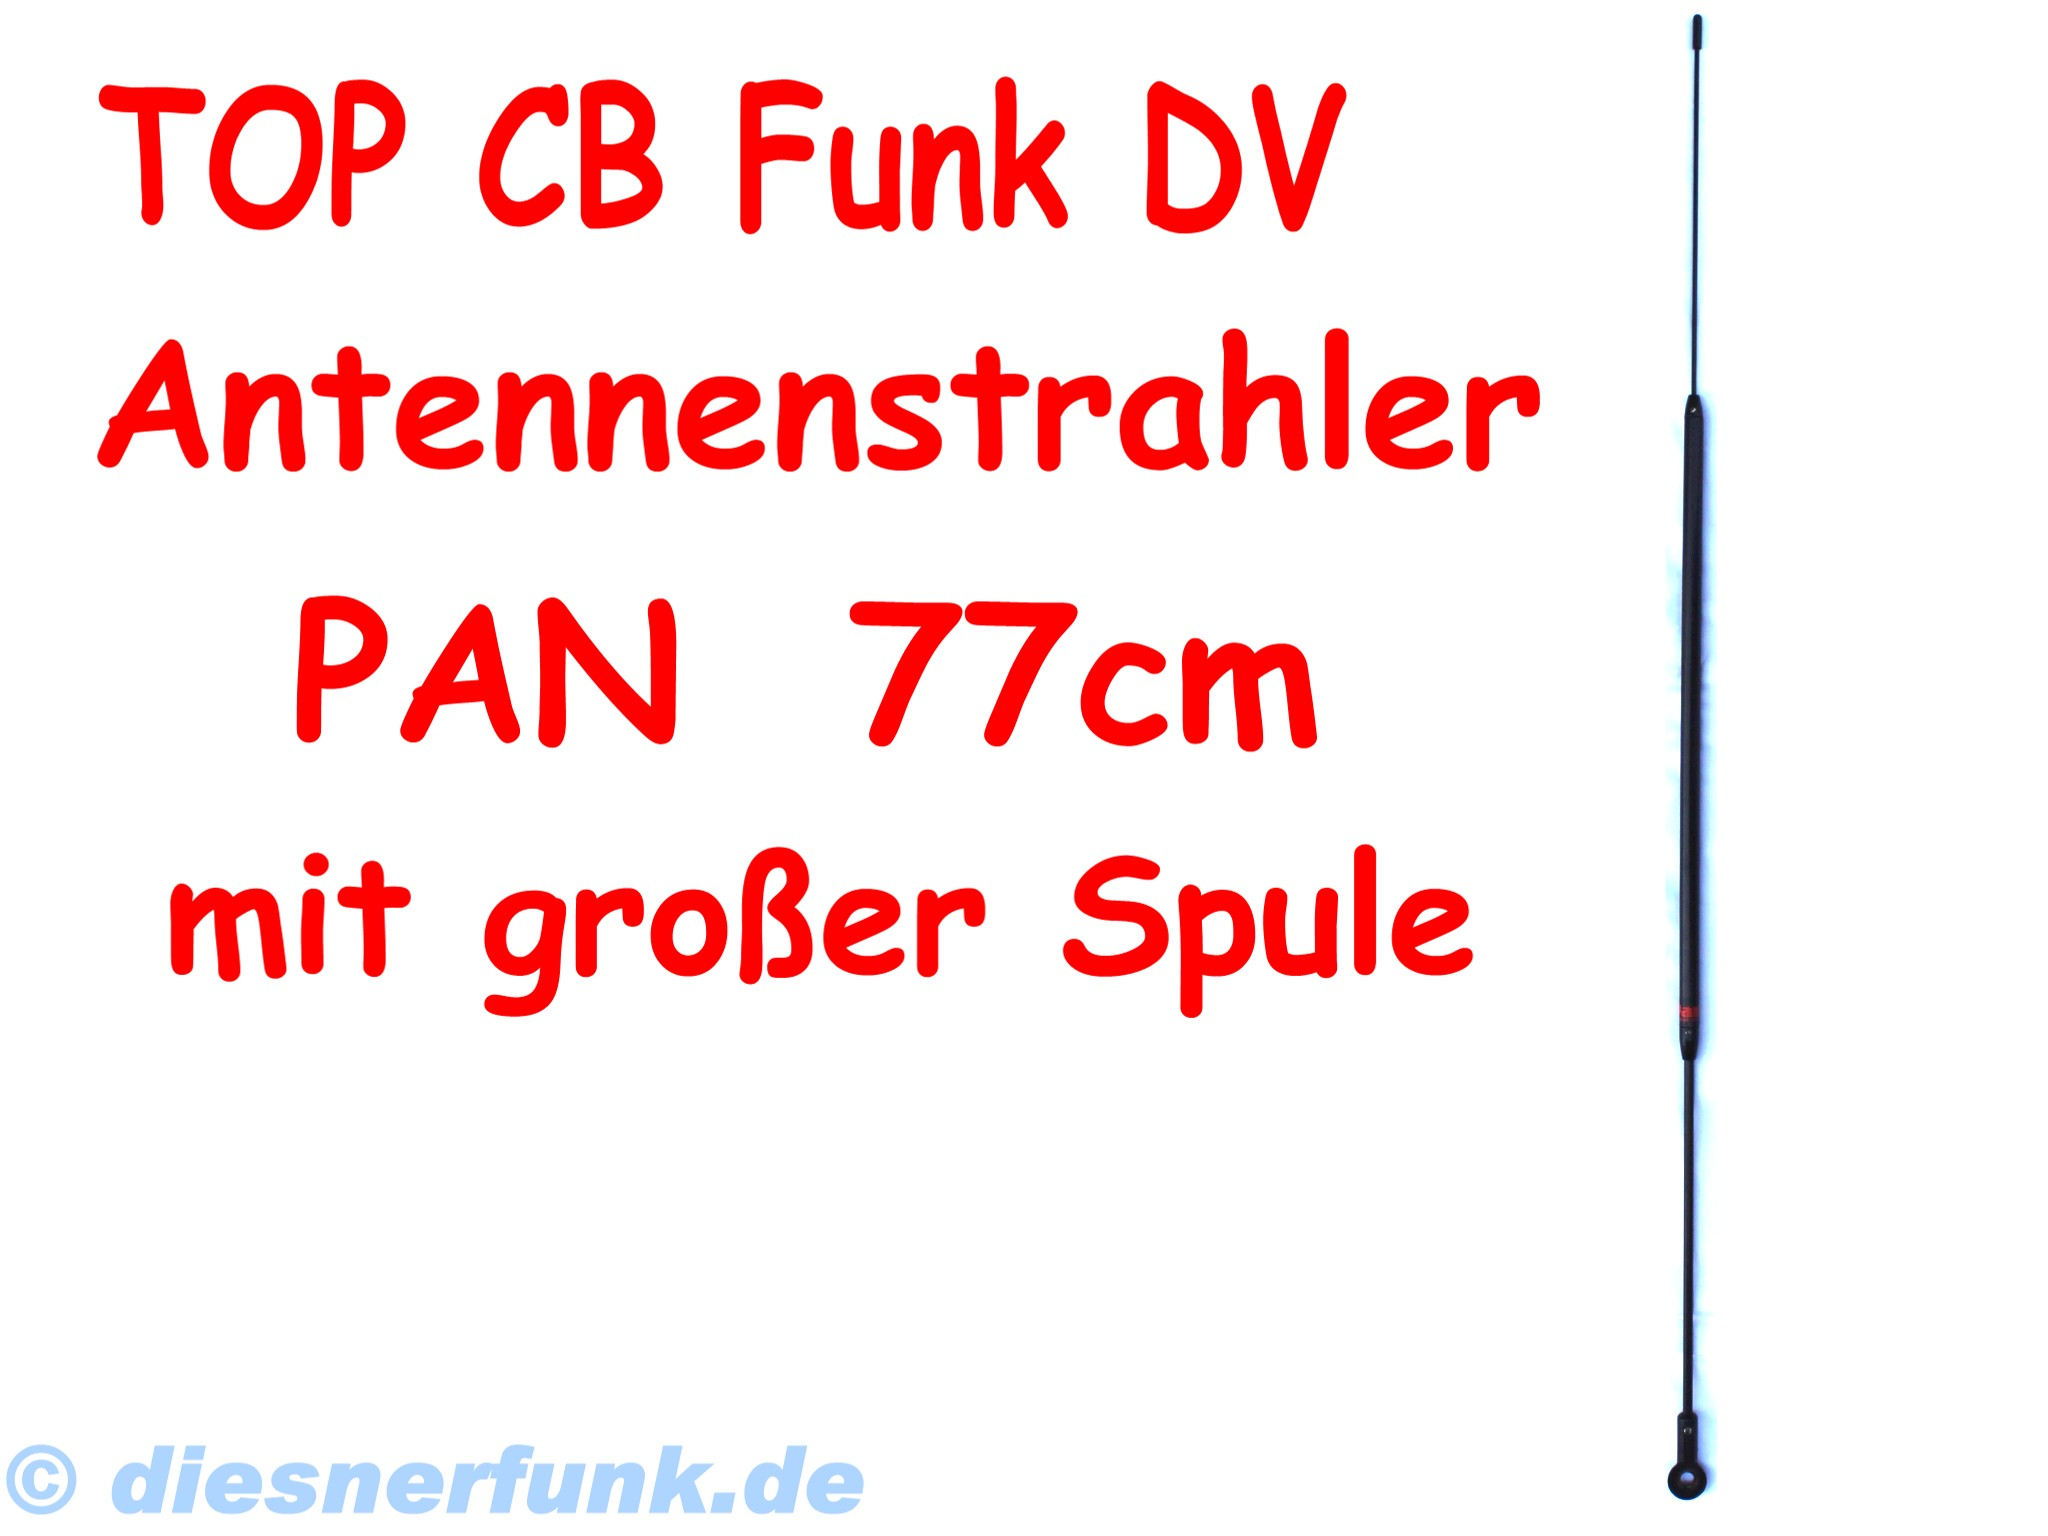 cb funk antennenstrahler pan 77cm mittelspule lkw actros. Black Bedroom Furniture Sets. Home Design Ideas